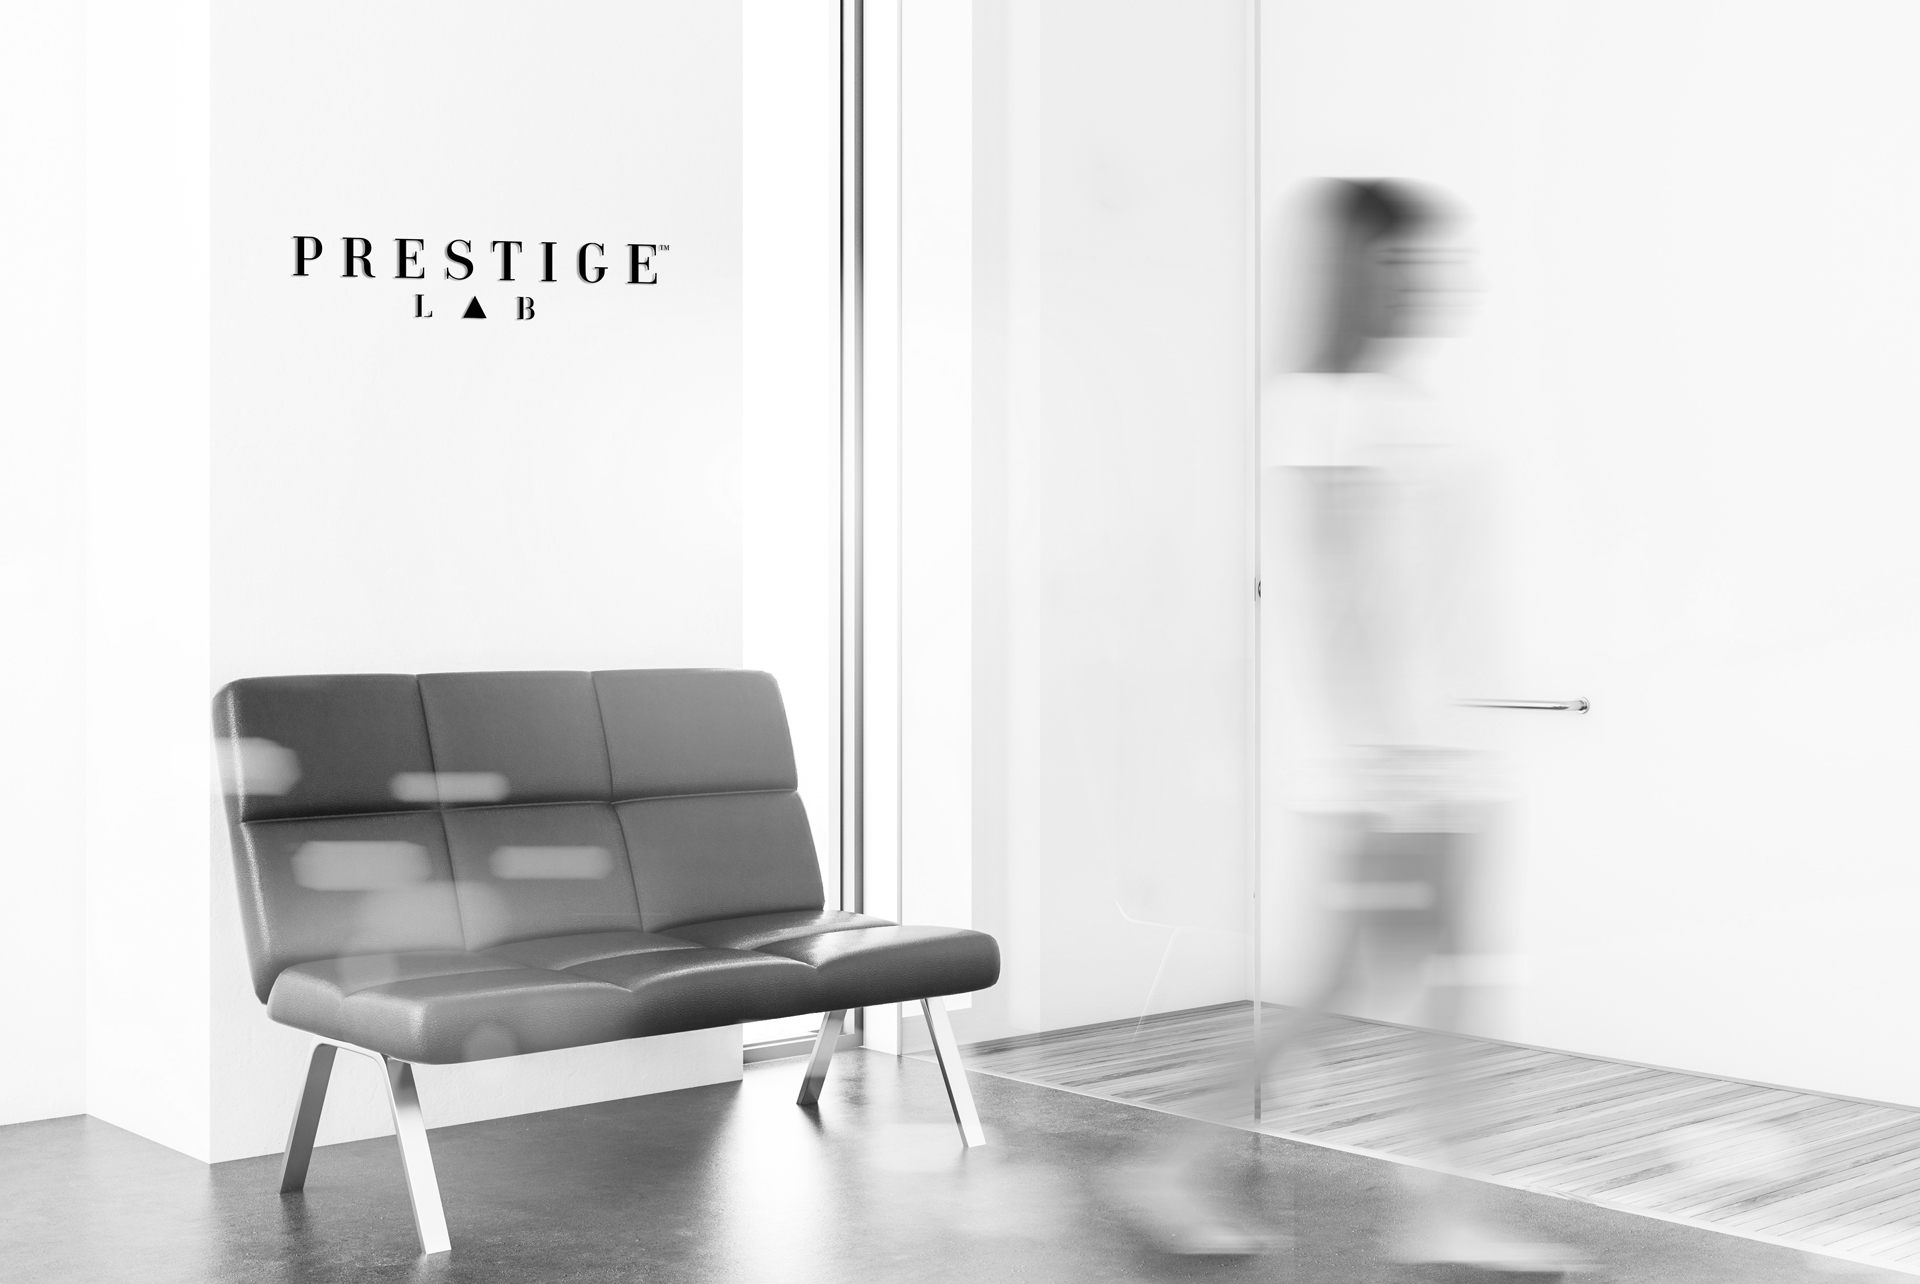 Logo Cosmetic Company Prestige Lab